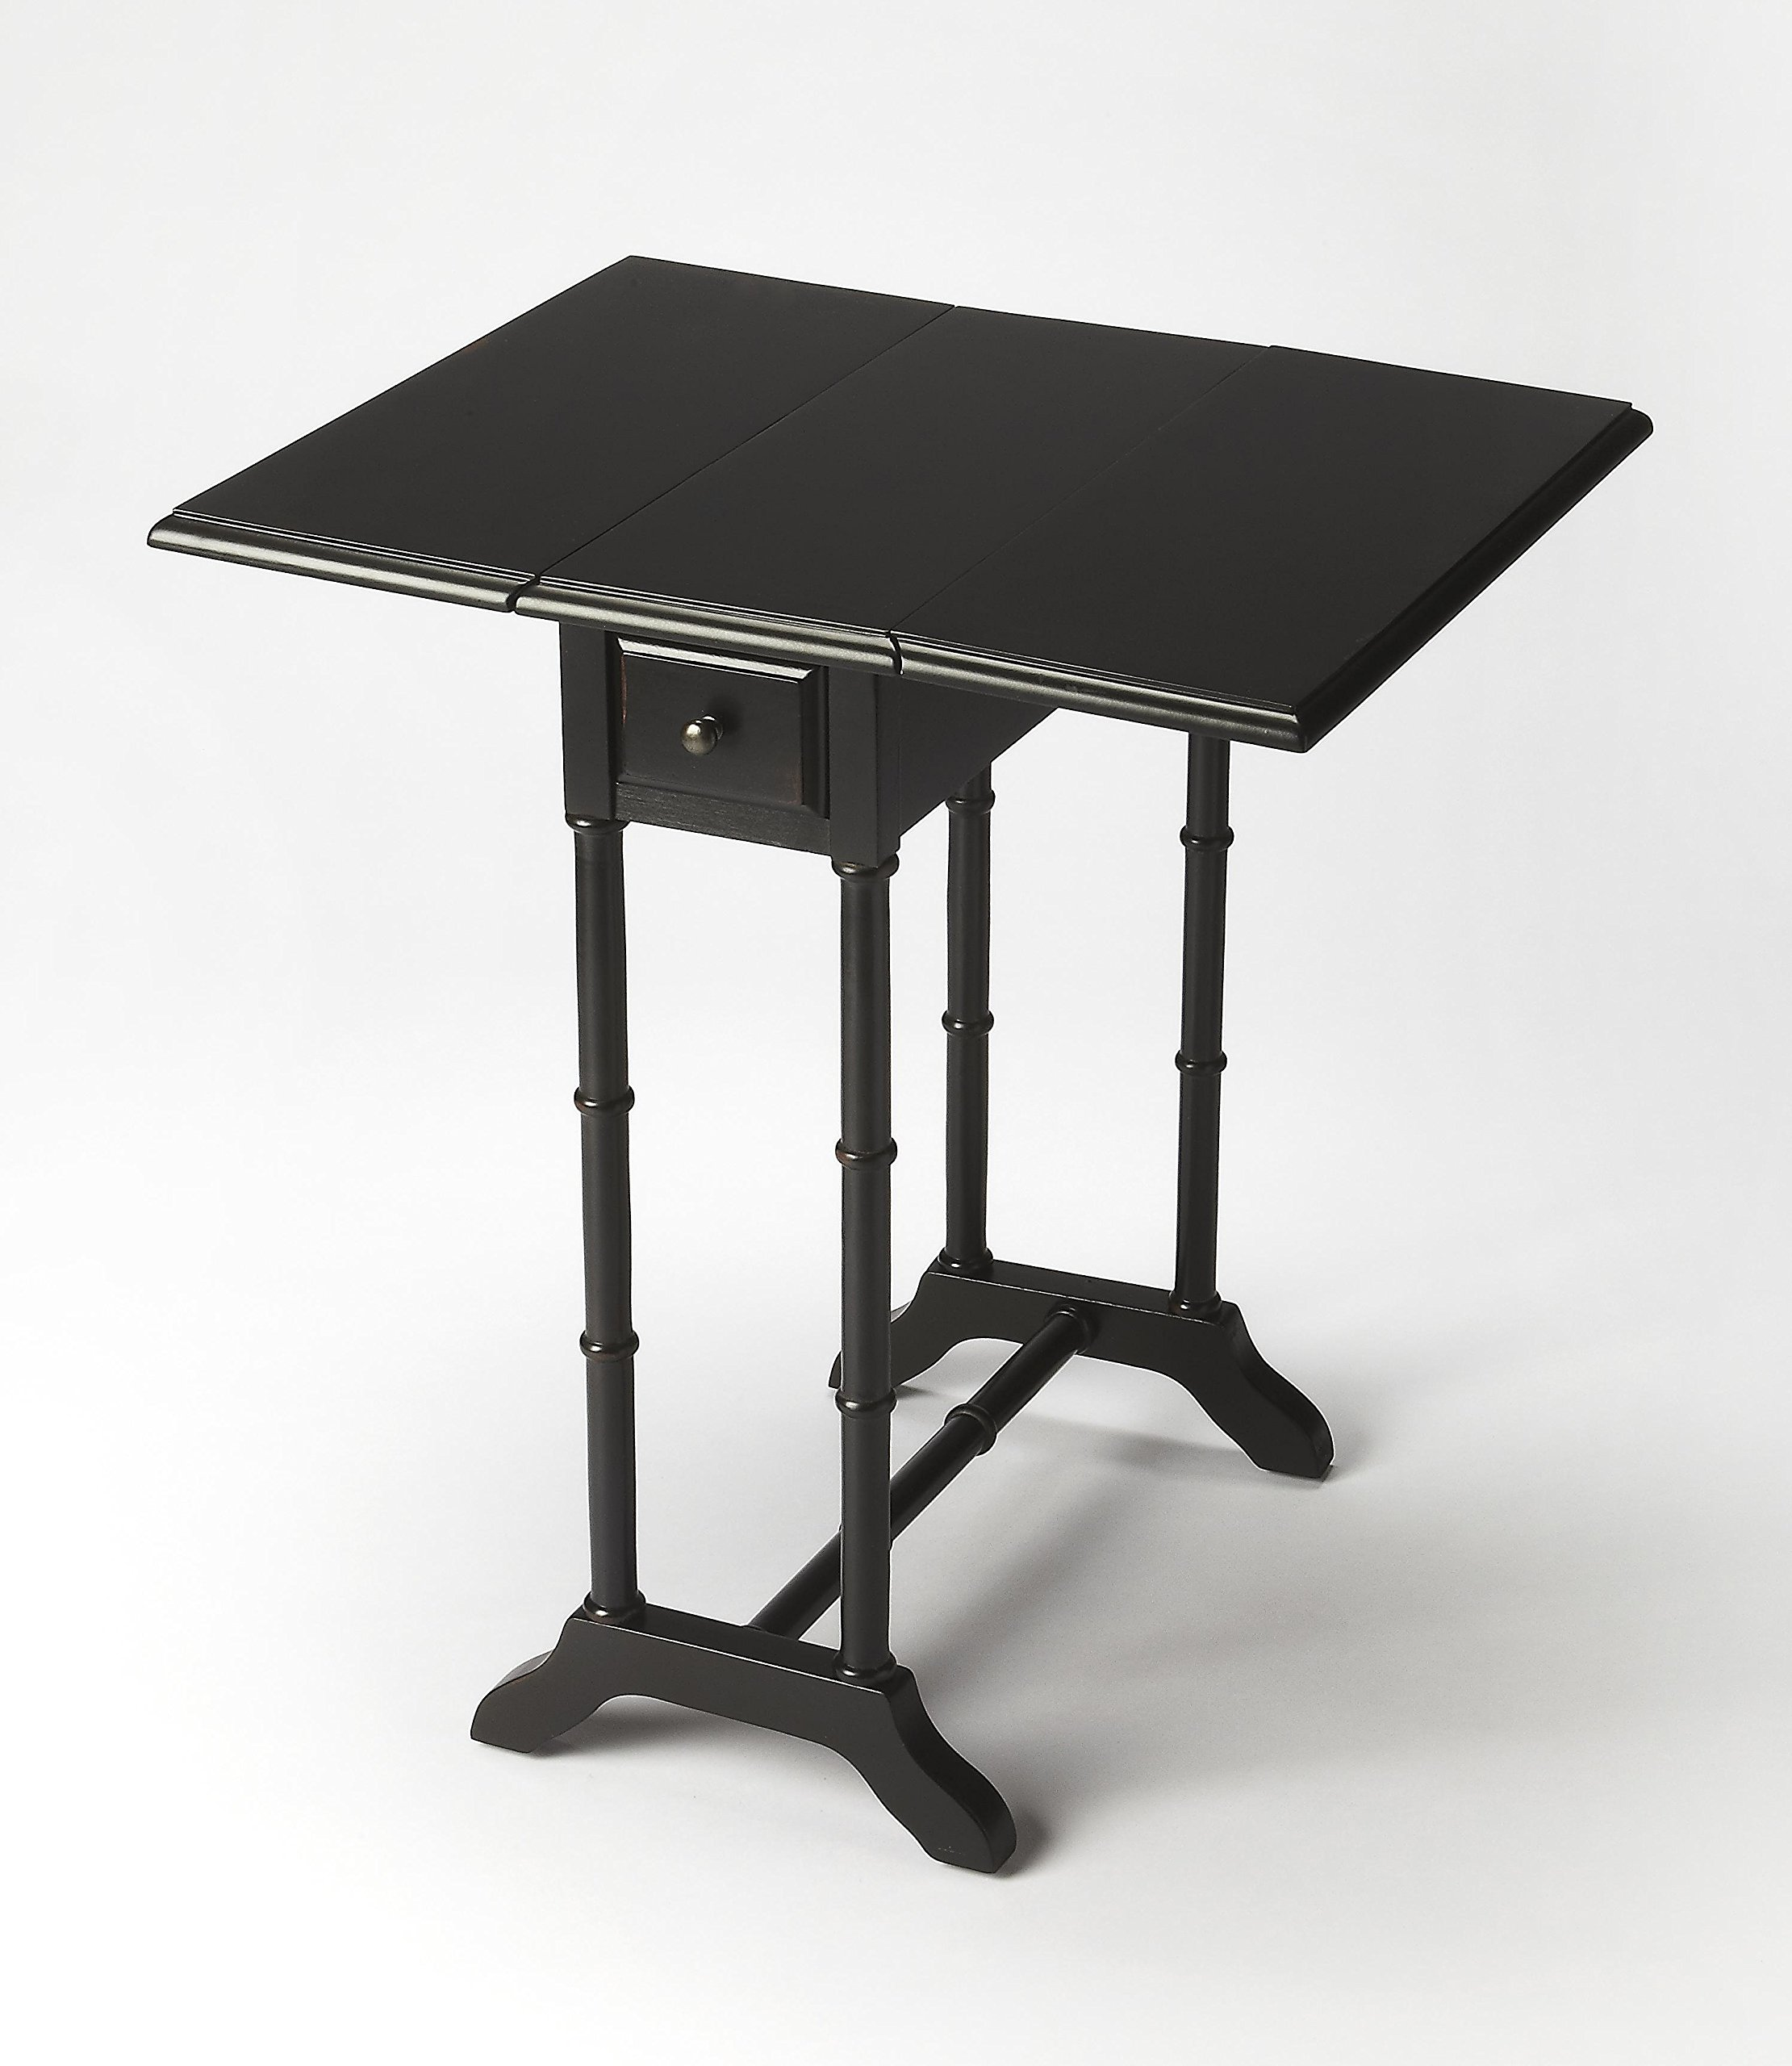 WOYBR 2334111 Drop-Leaf Table